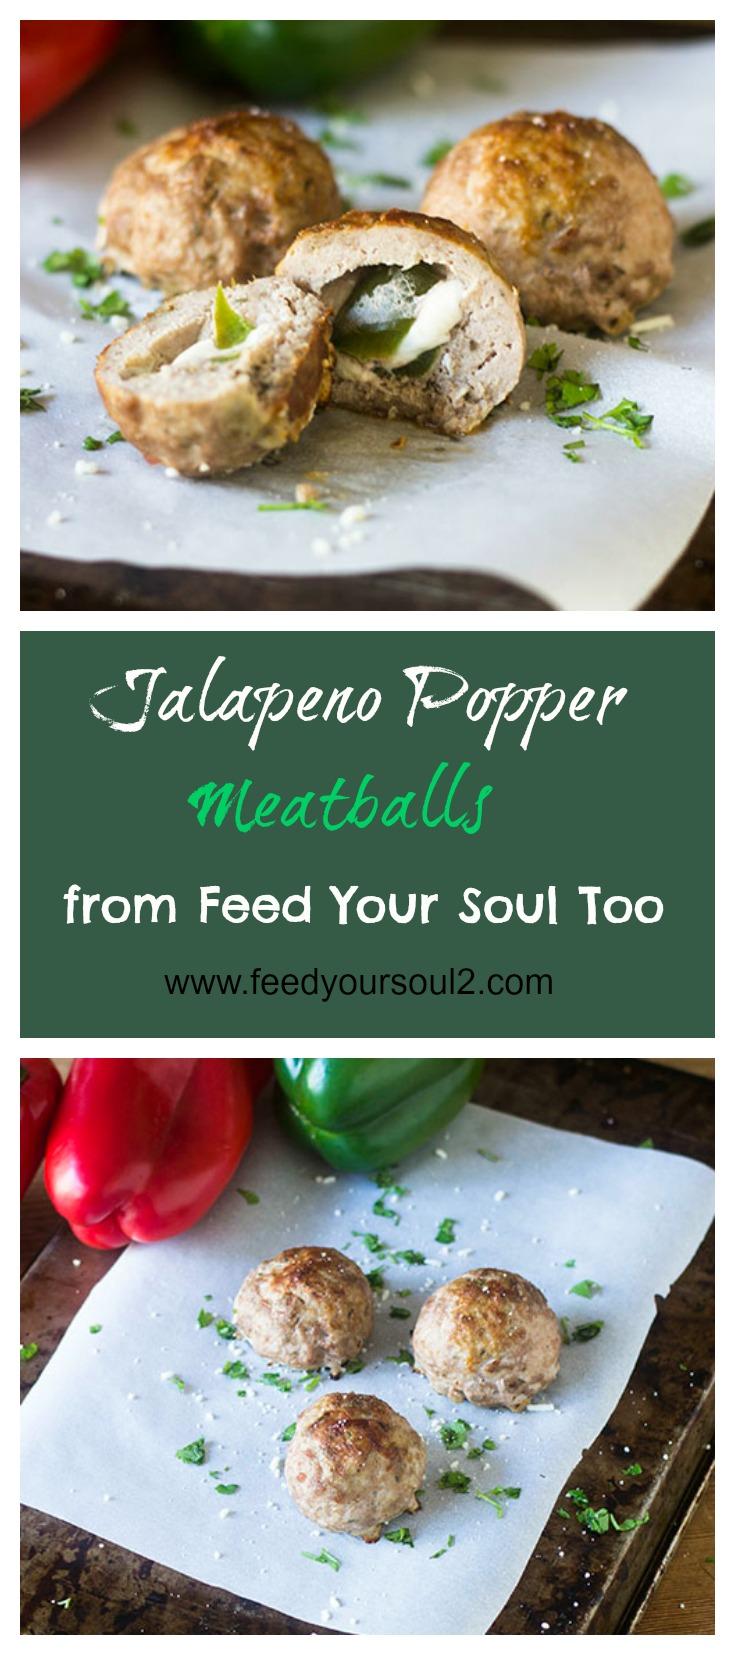 Jalapeno Popper Stuffed Meatballs #meatballs #Mexicanfood #jalapenos #appetizer   feedyoursoul2.com